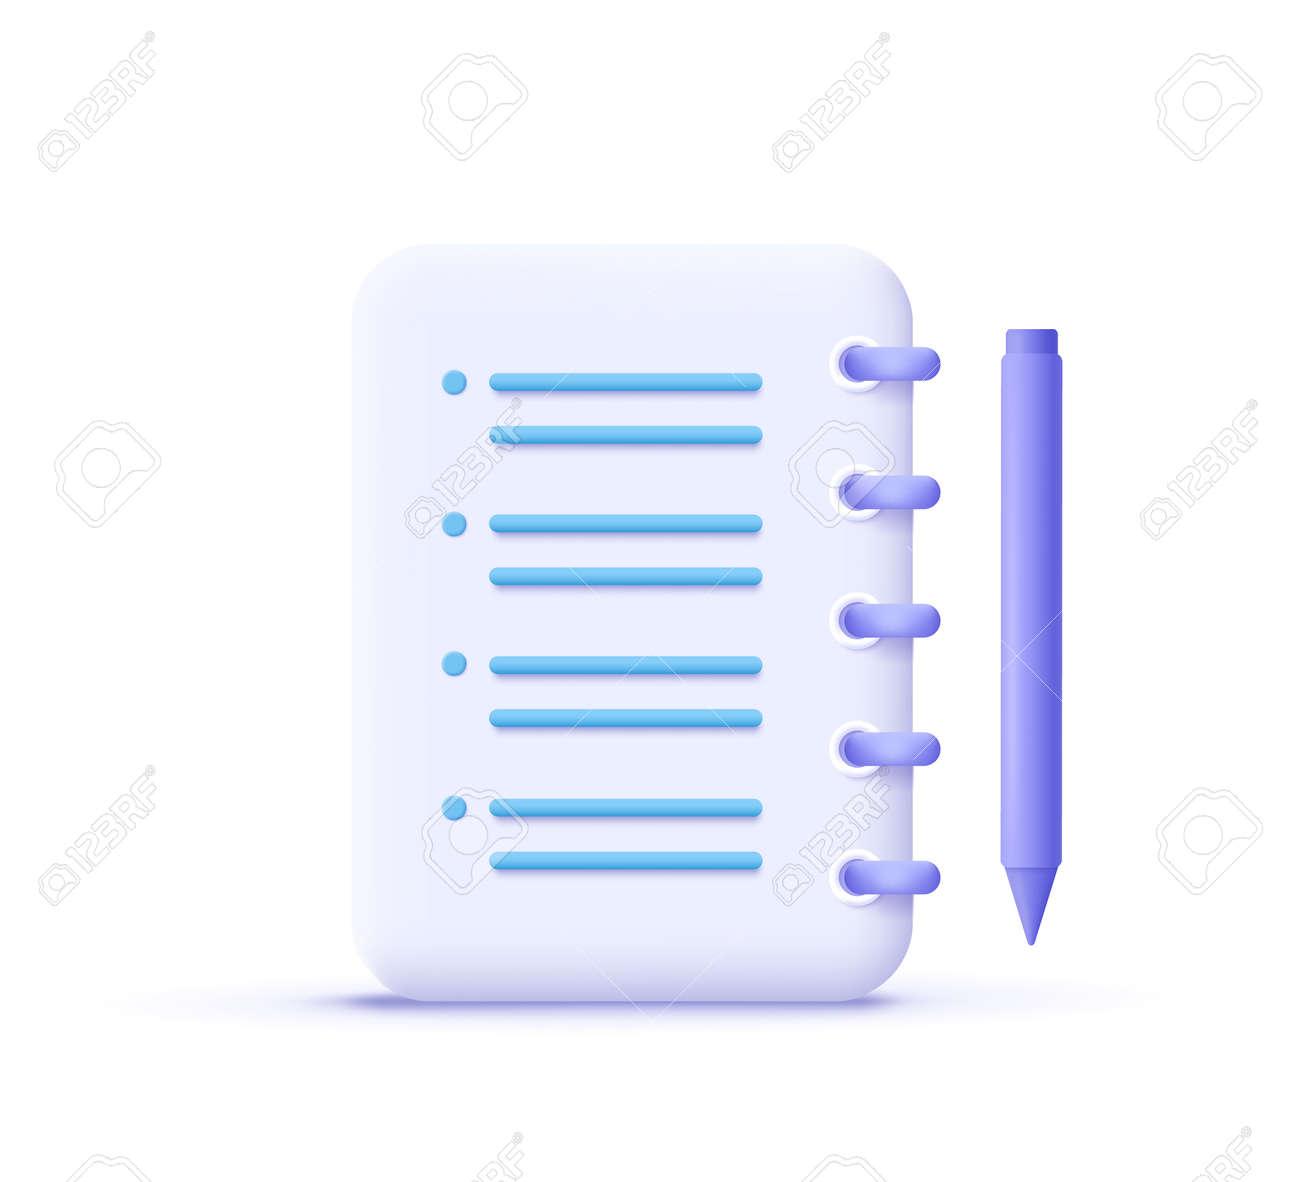 Assignment icon. Clipboard, checklist, document symbol. 3d vector illustration. - 171413963